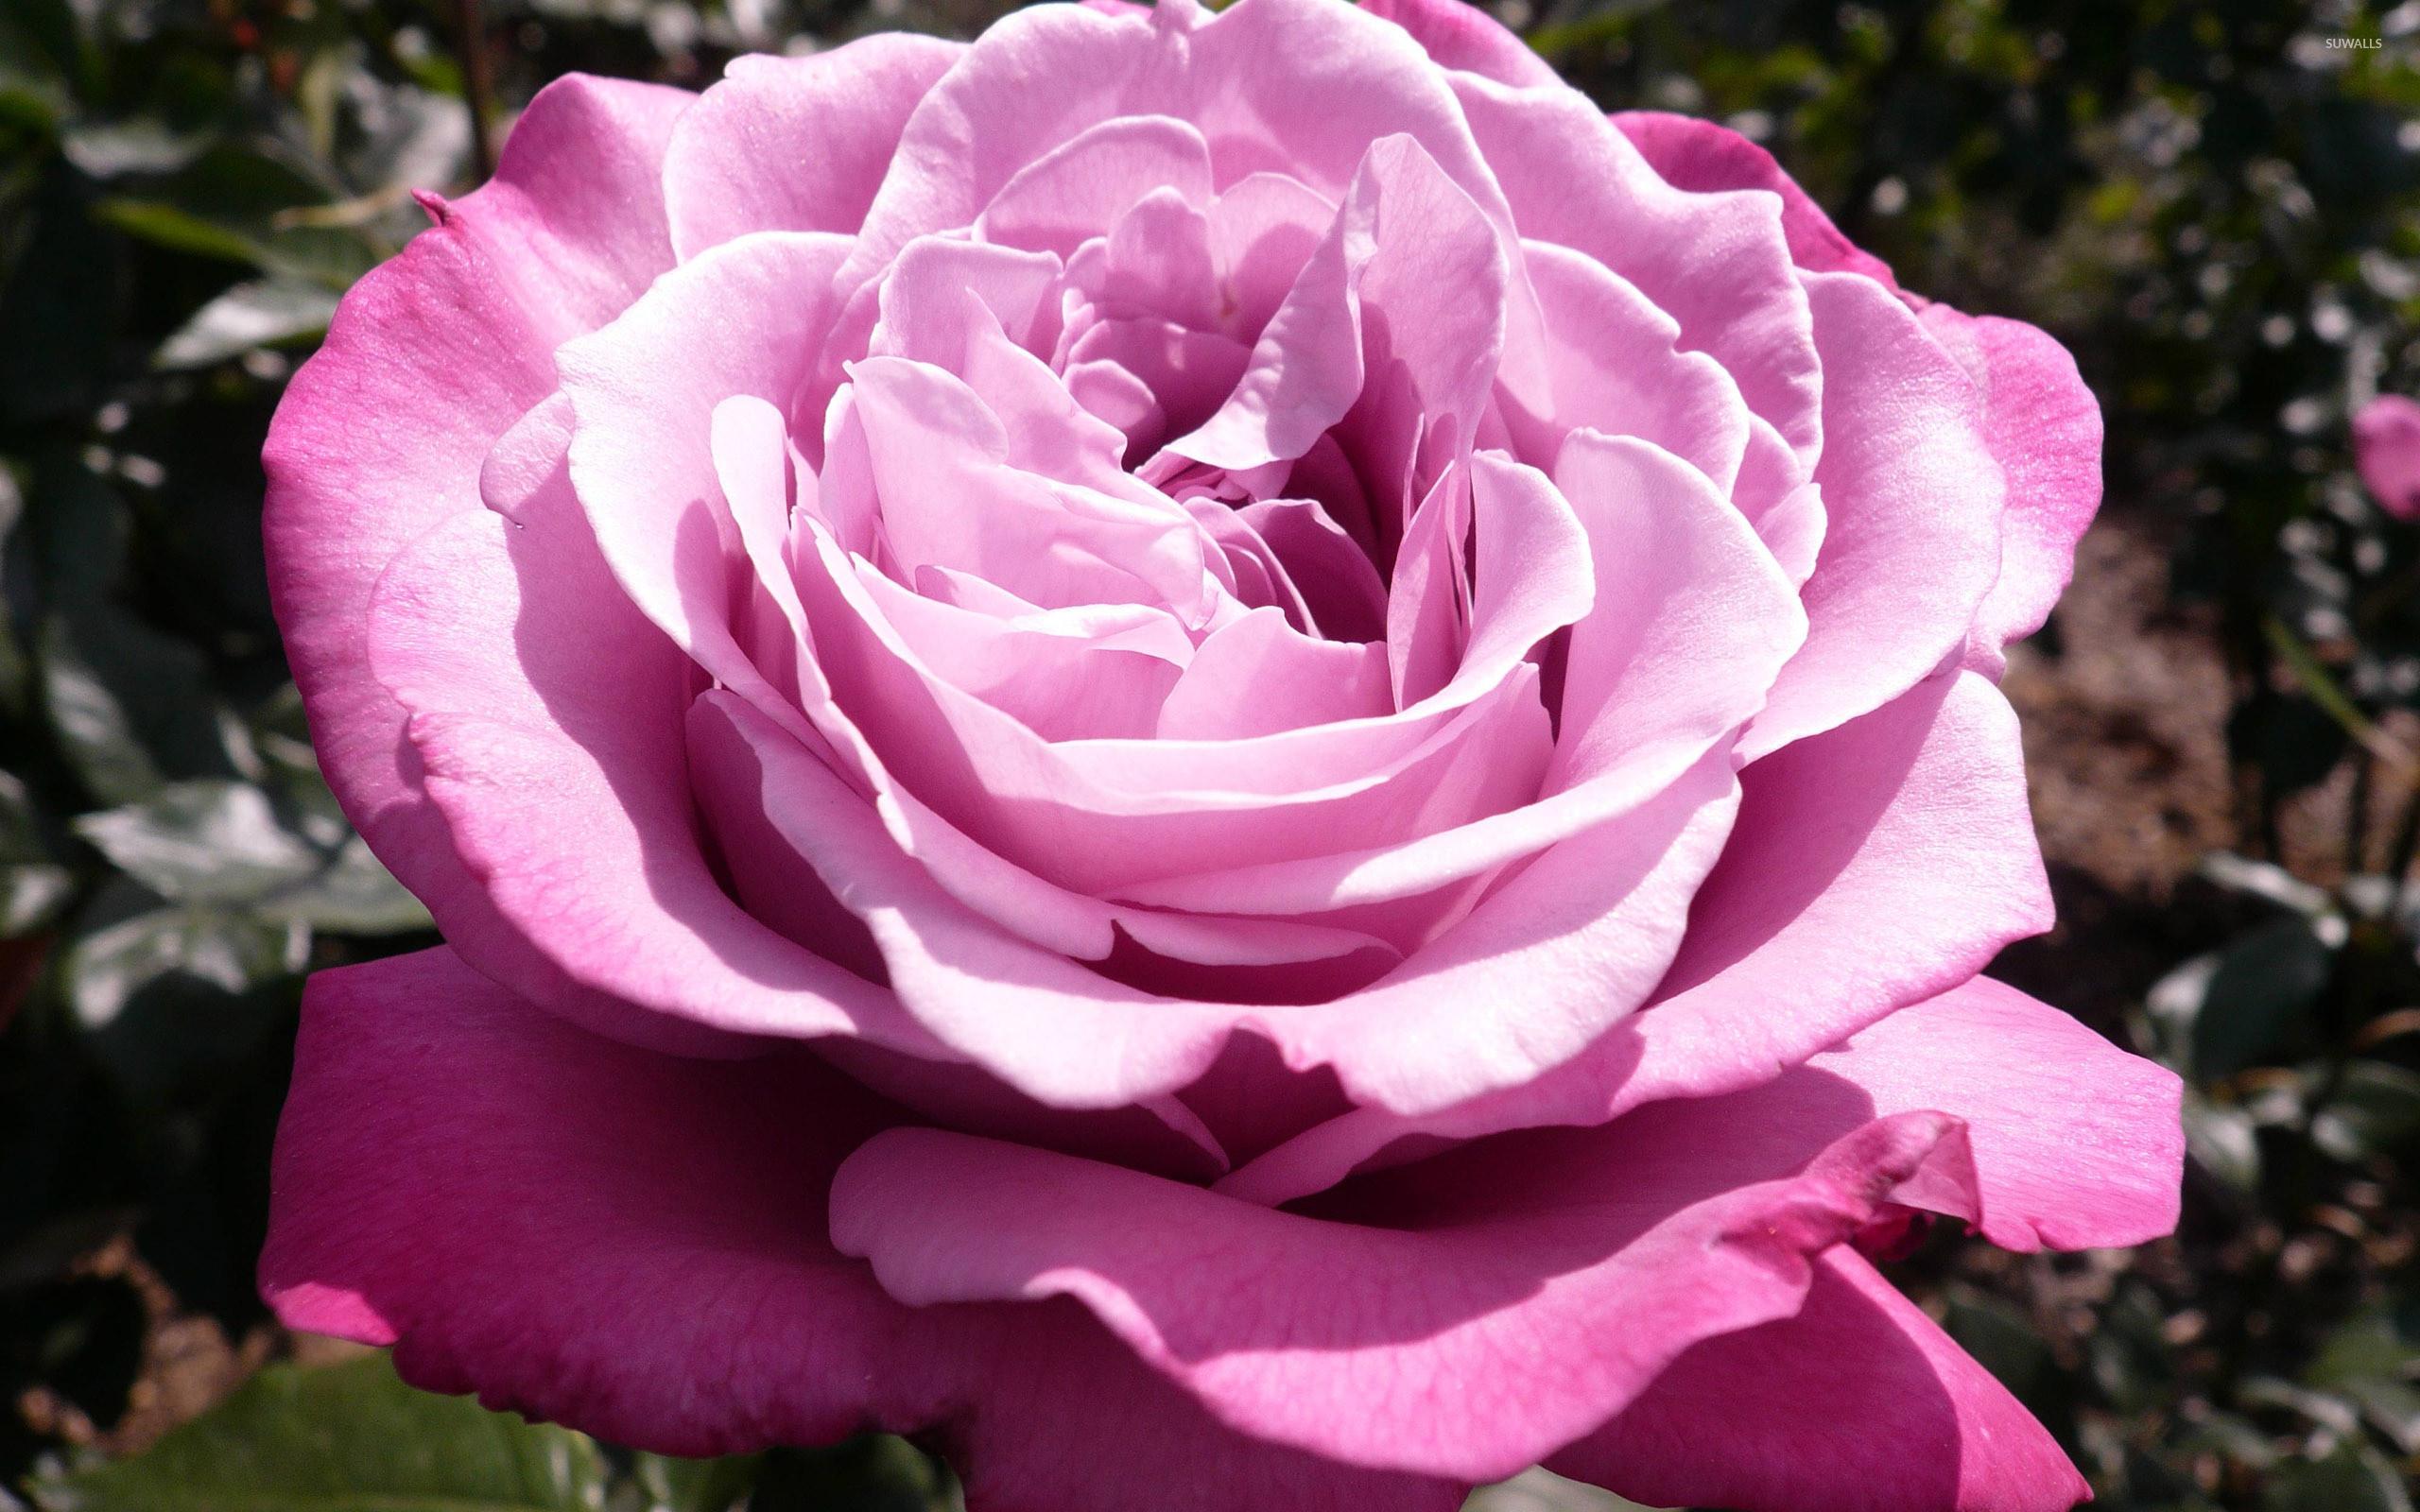 Res: 2560x1600, Purple rose [3] wallpaper